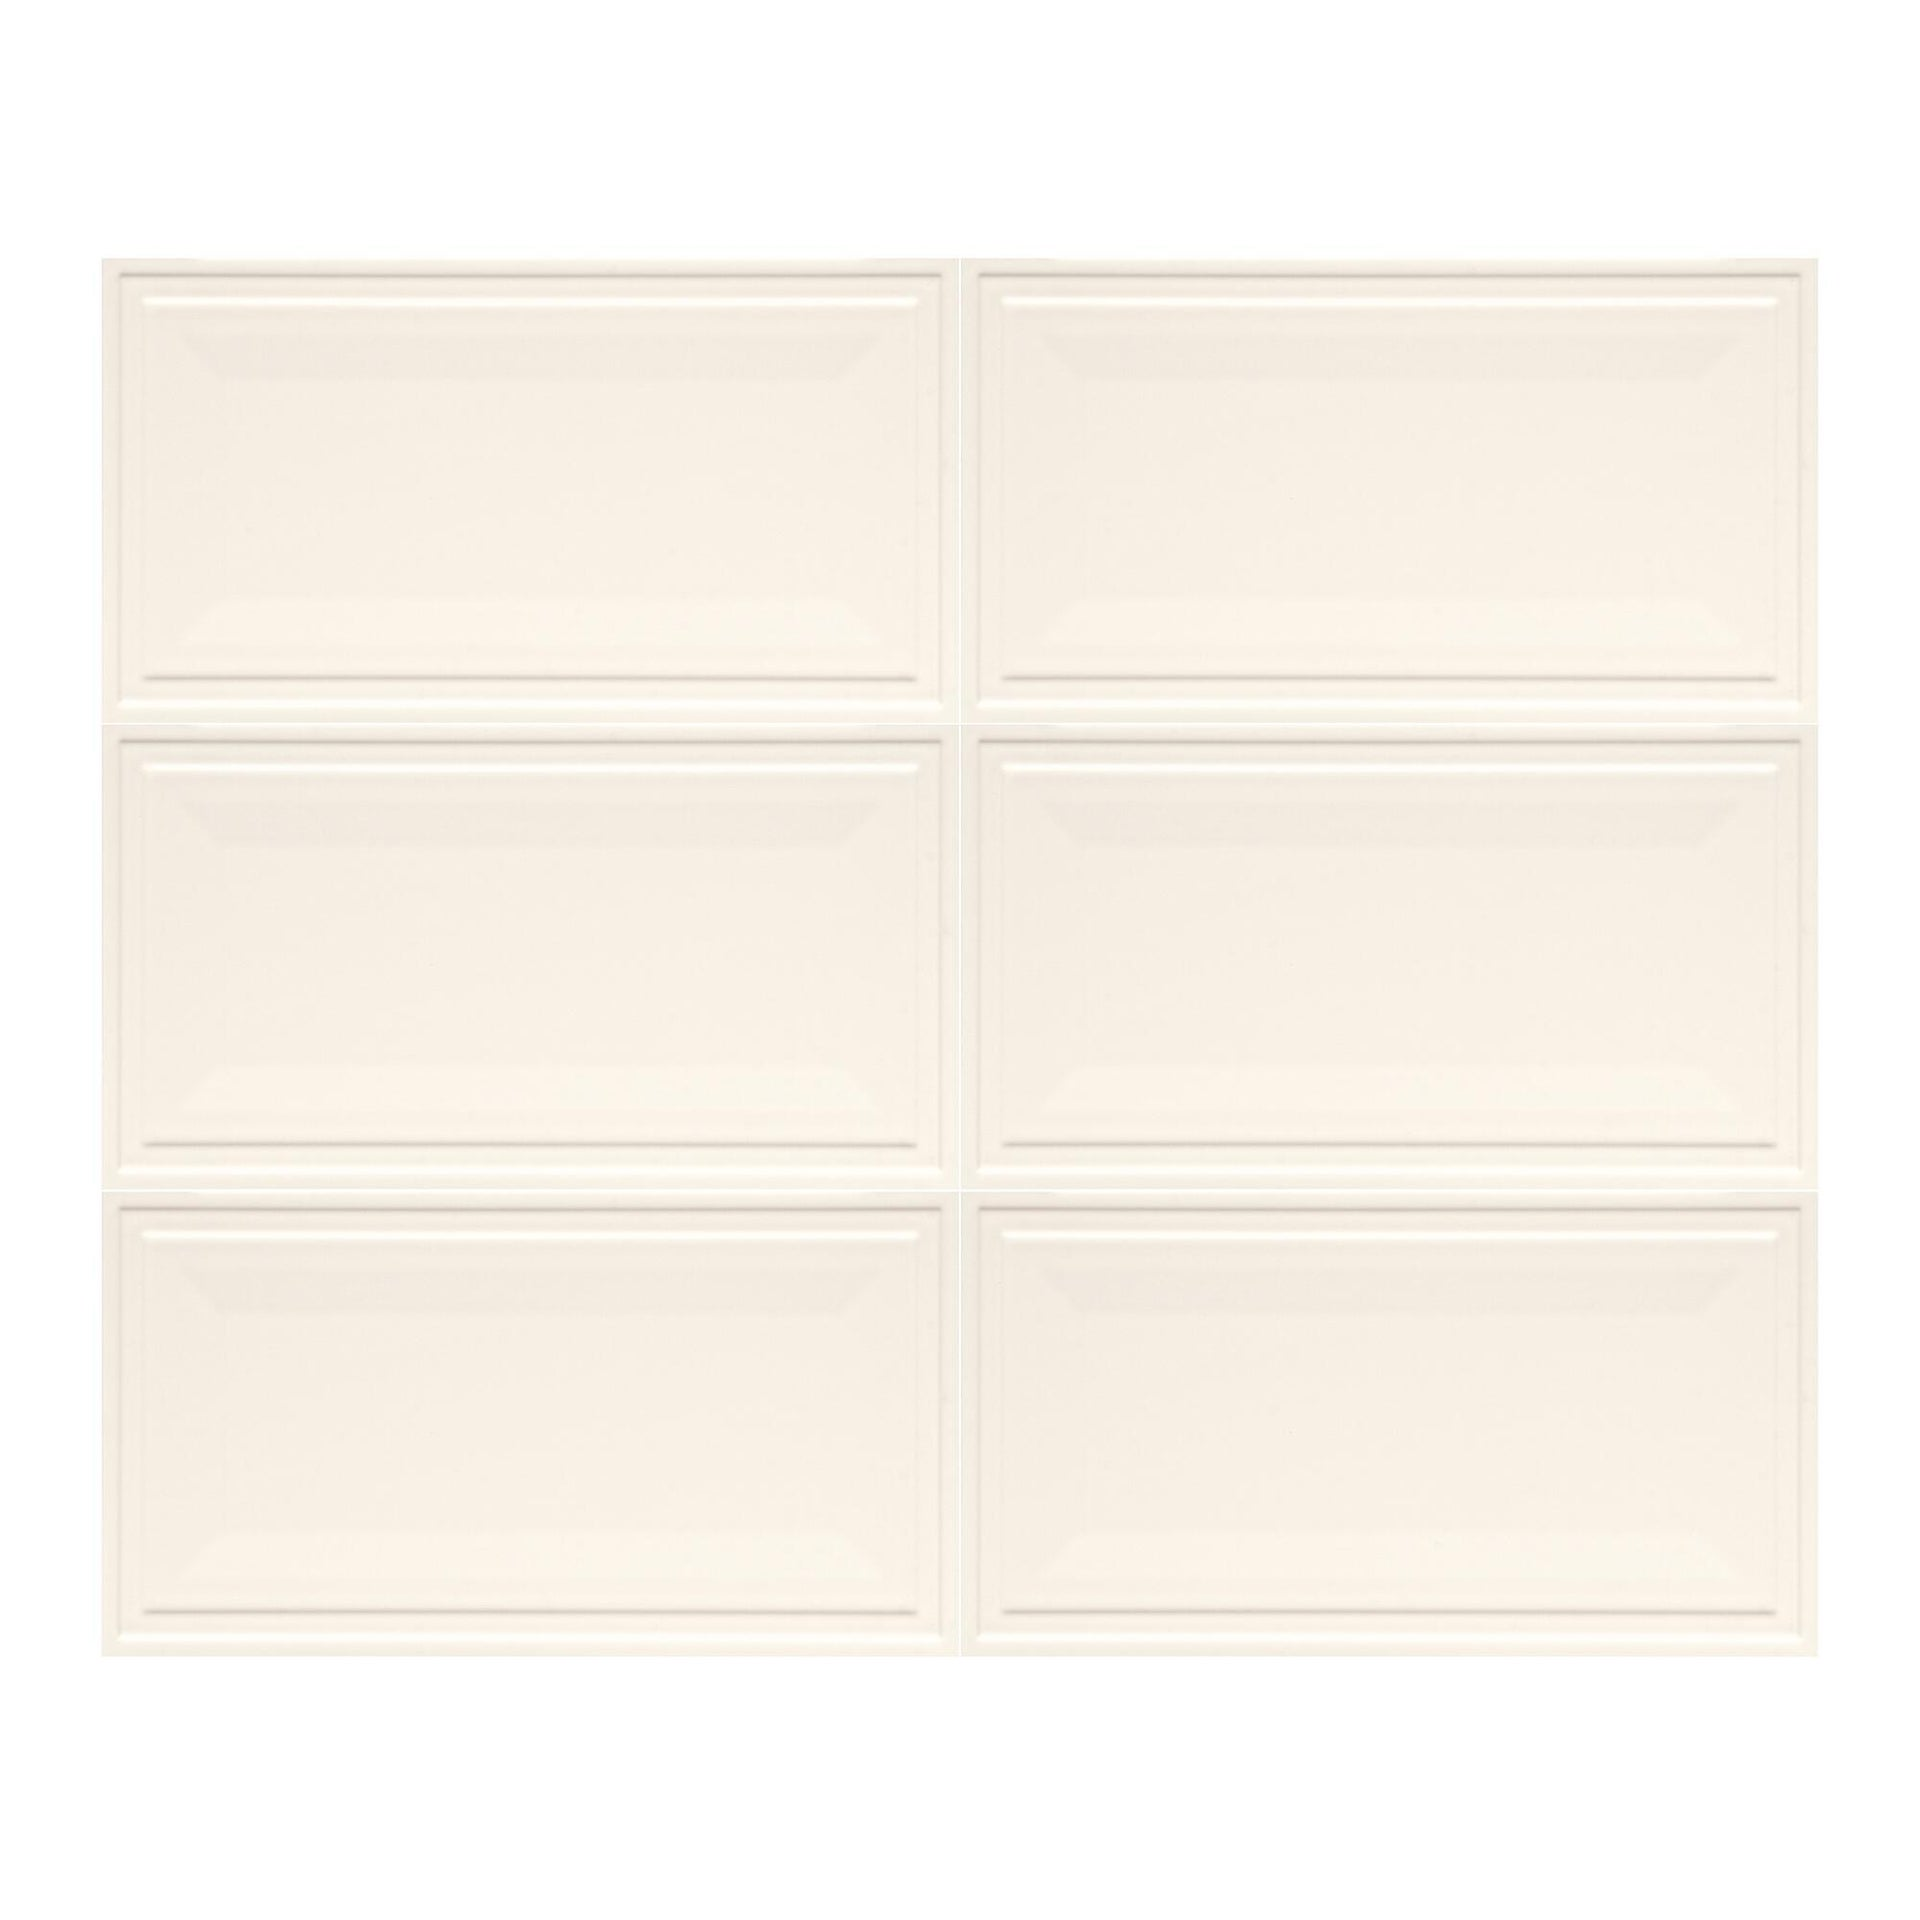 Piastrella per rivestimenti New Classic 30 x 56 cm sp. 10 mm bianco - 7